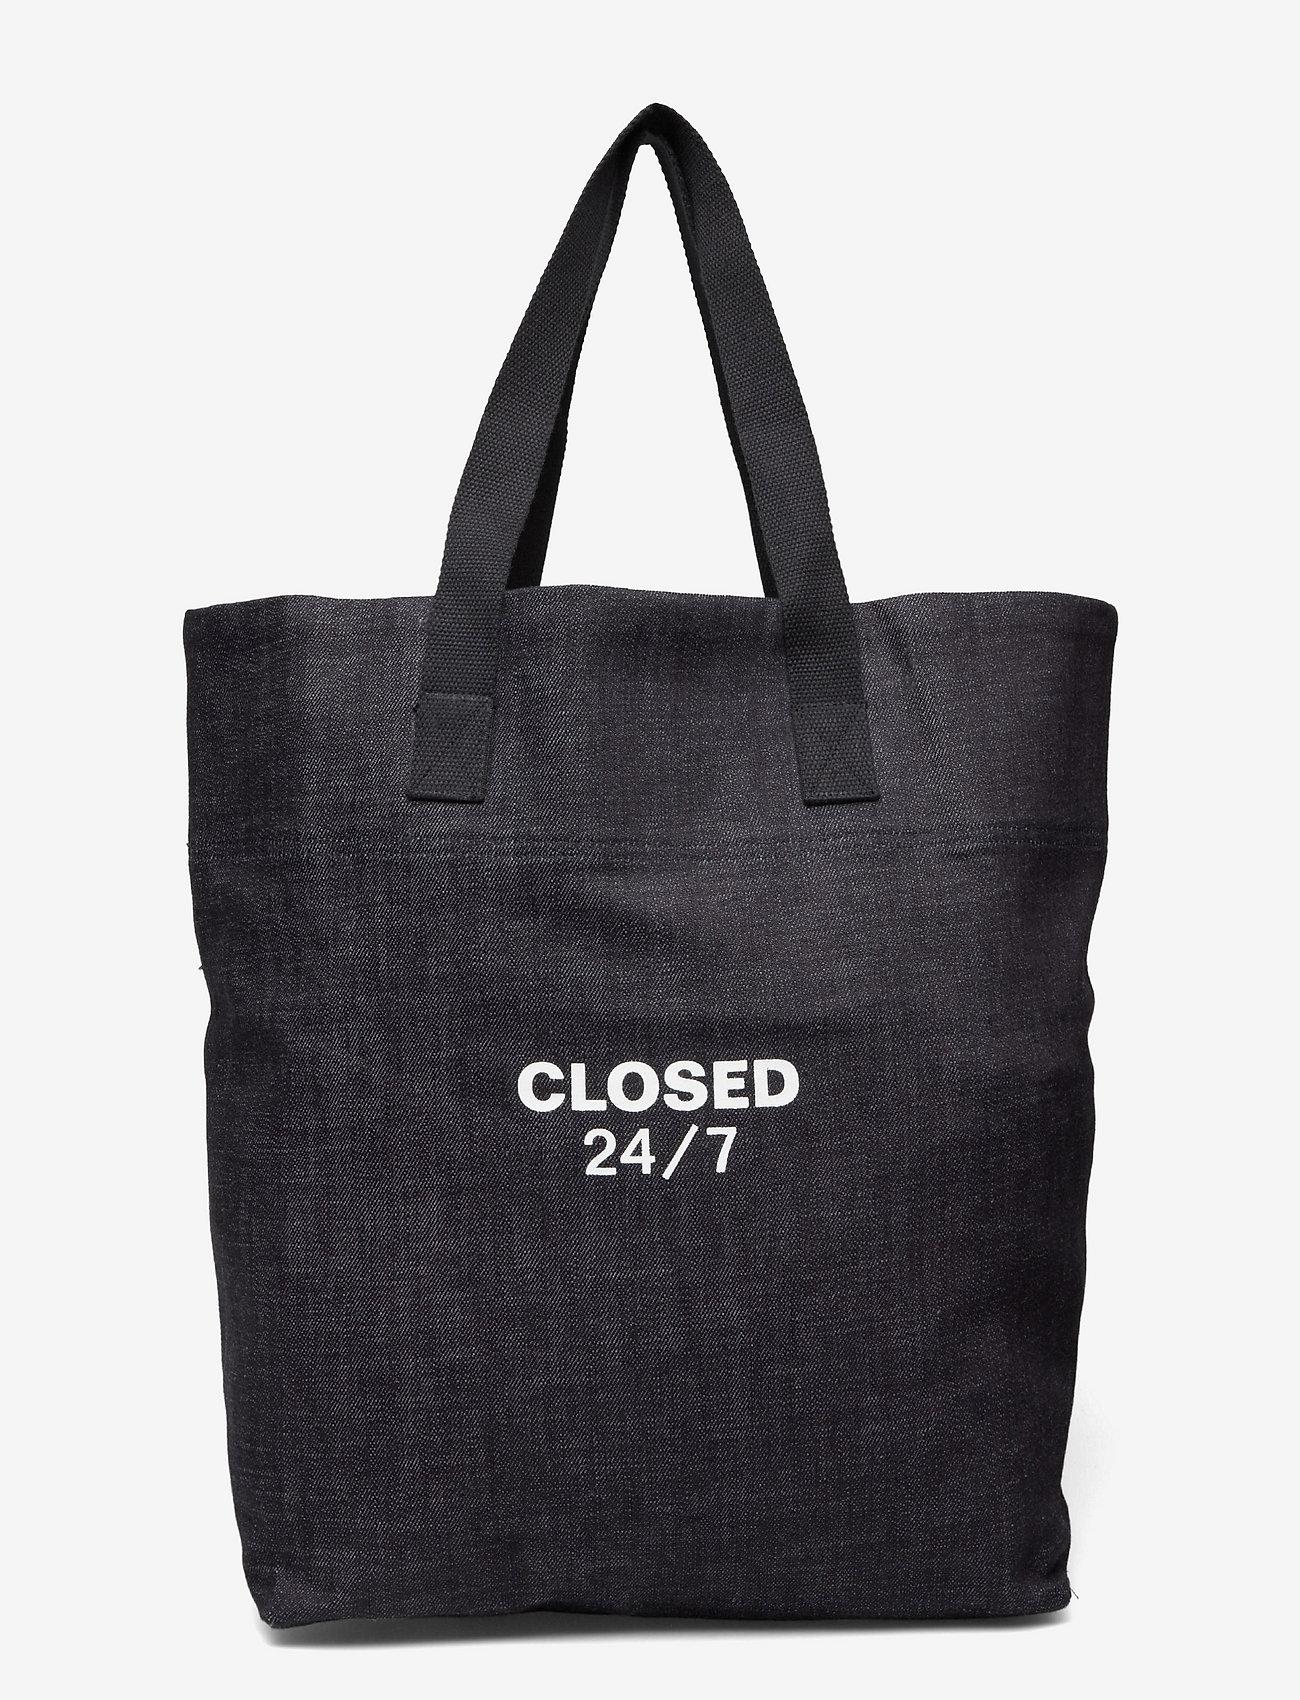 Closed - mens accessories - shoppers - dark blue - 0